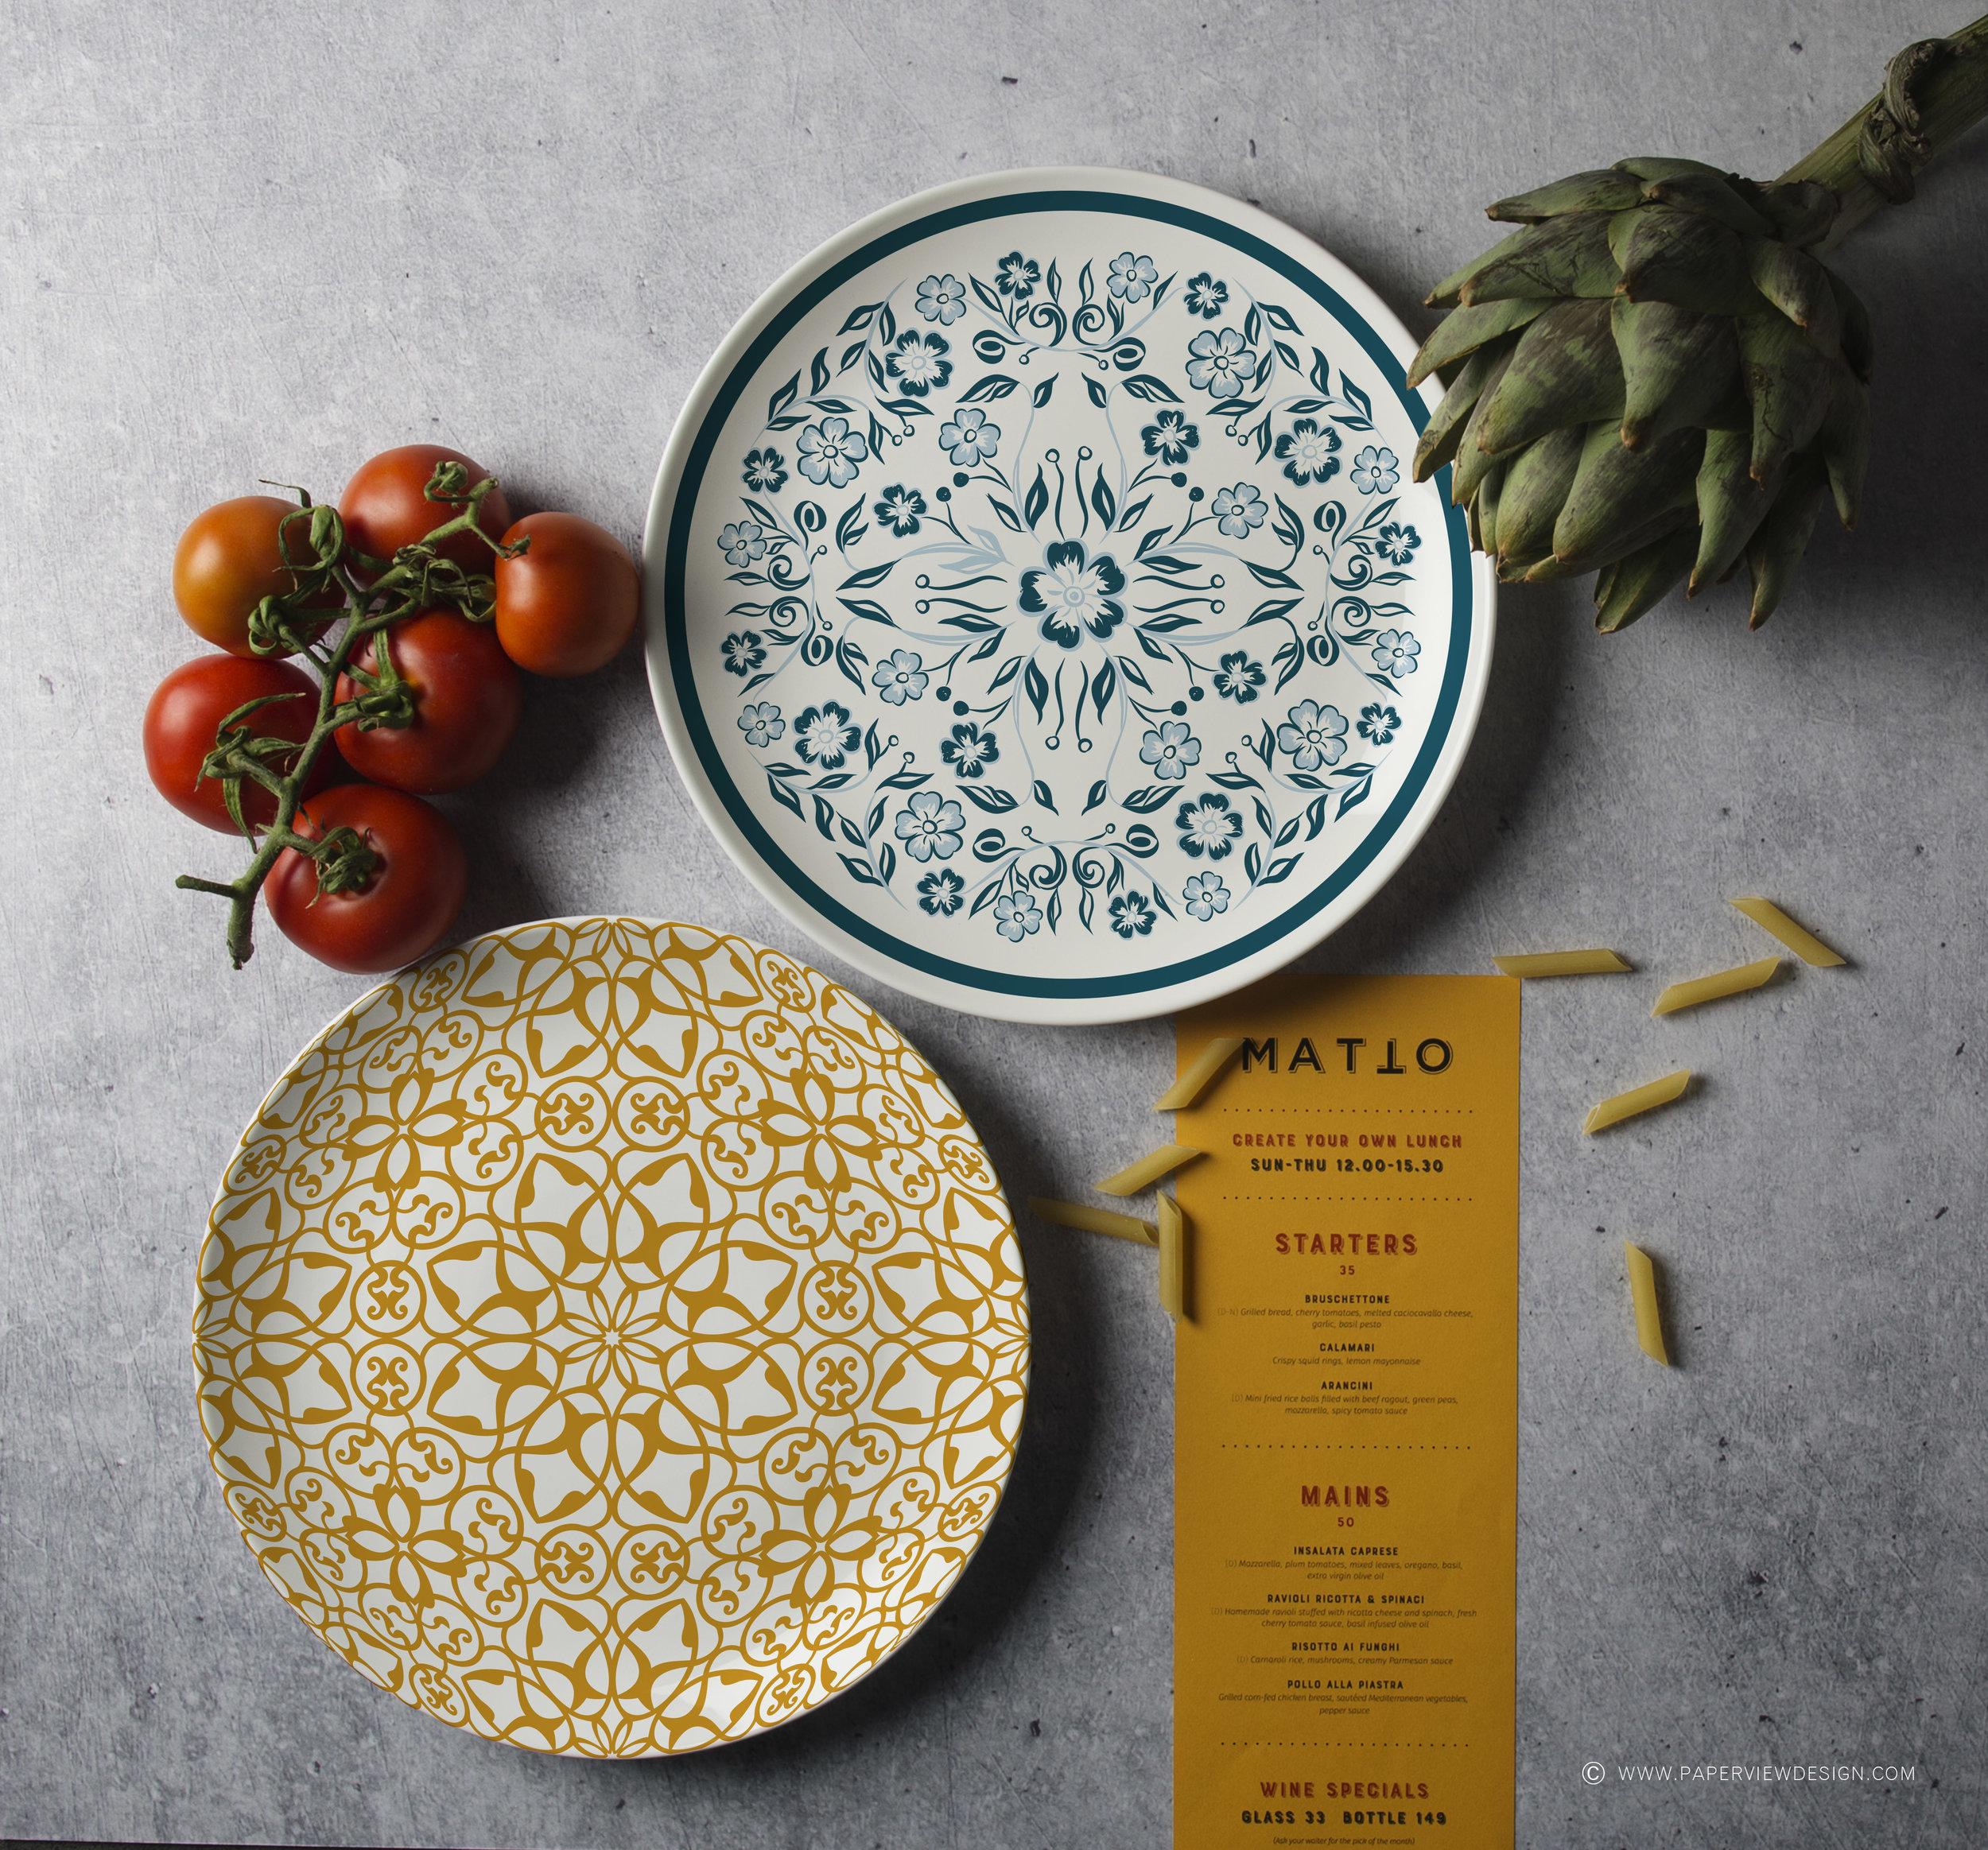 Plates-Desing-Mood-Colors-Pasta-Yellow-Concrete-Textures